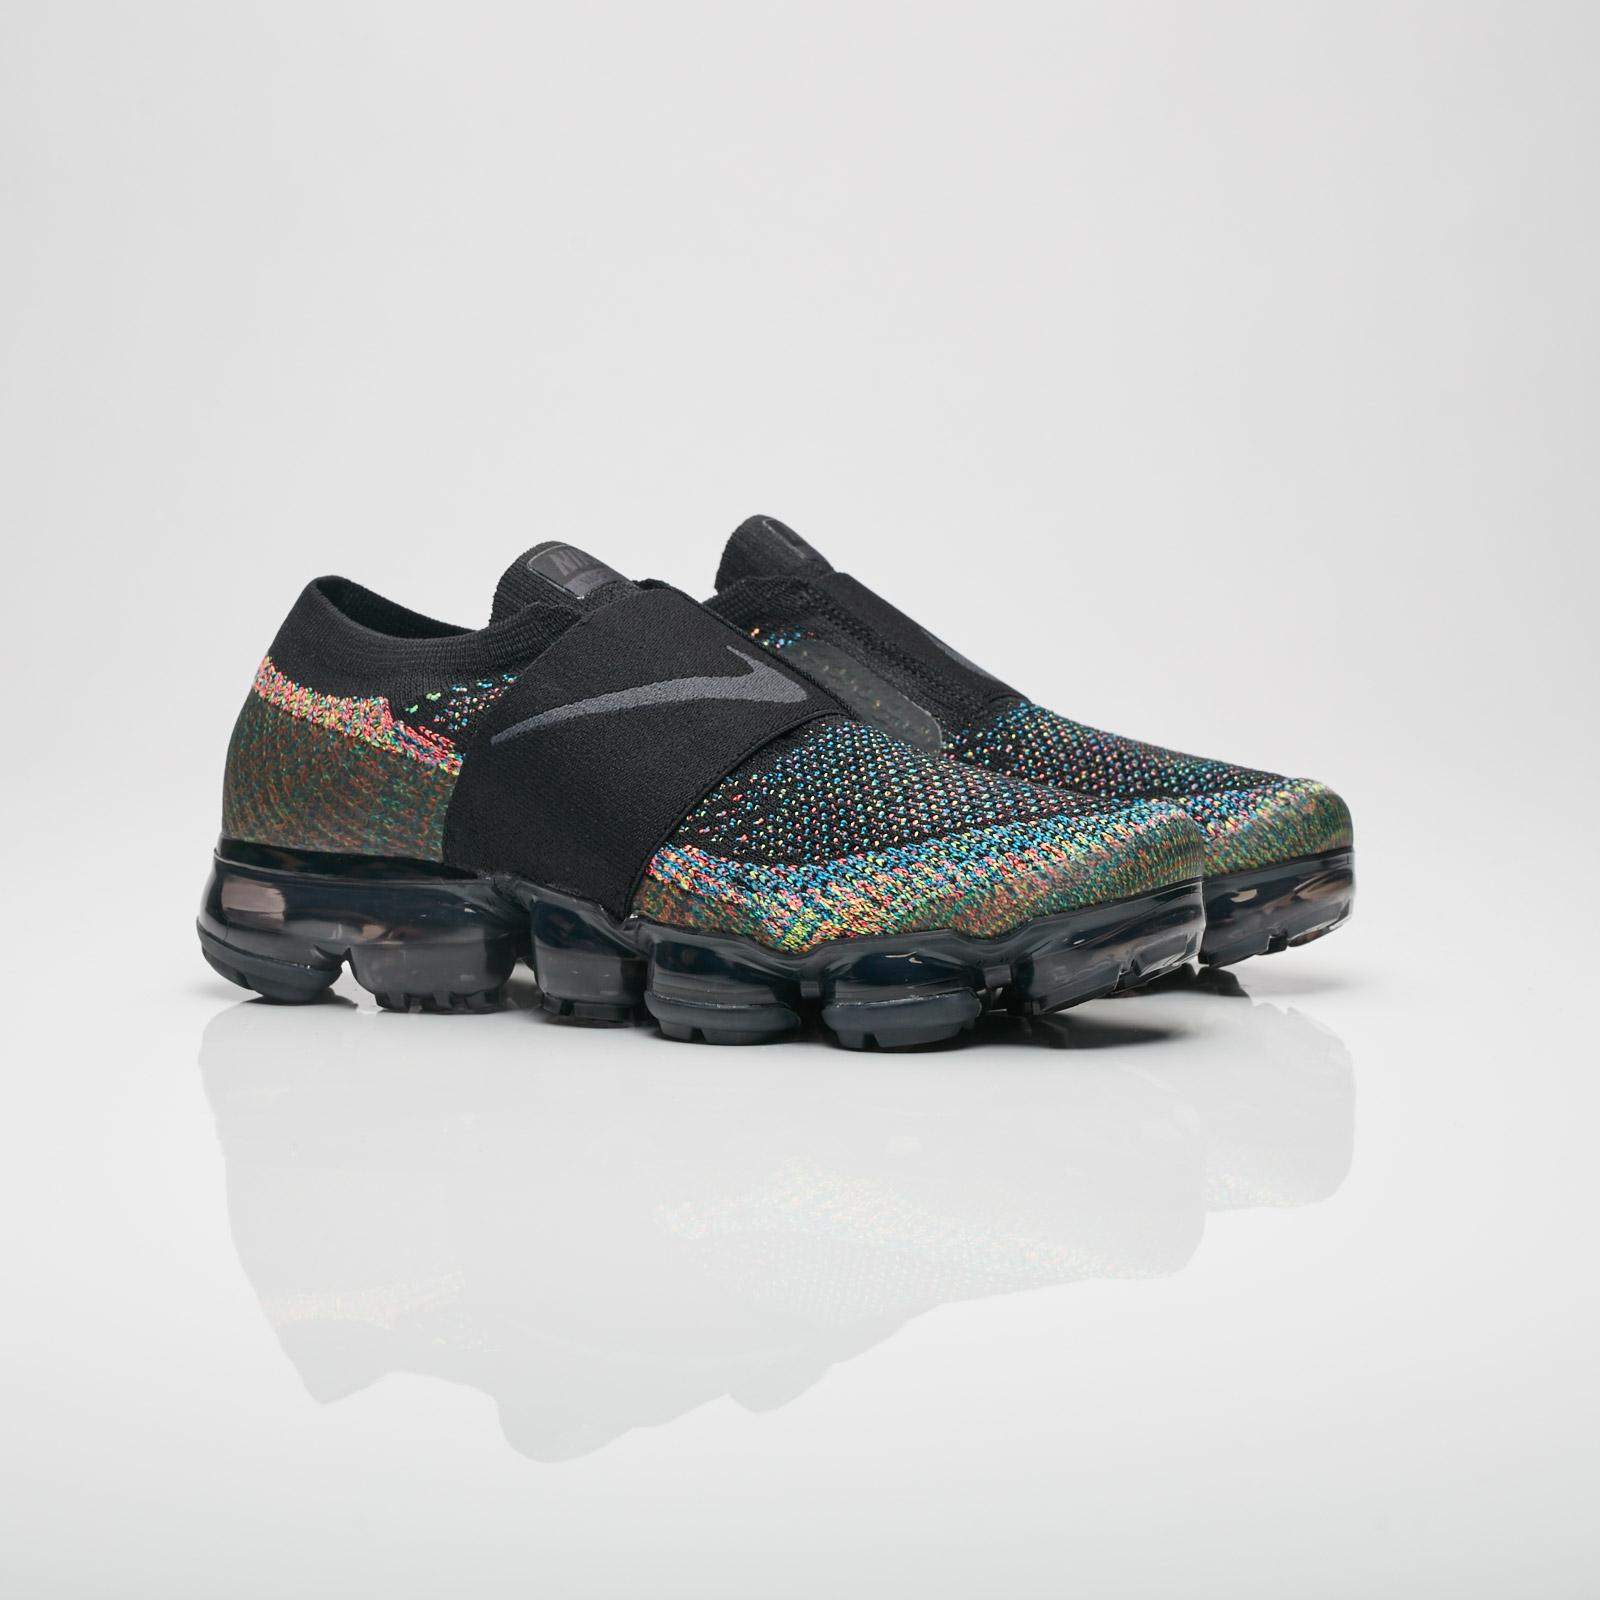 eec10d55a3c Nike Wmns Air Vapormax Flyknit MOC - Aa4155-003 - Sneakersnstuff ...